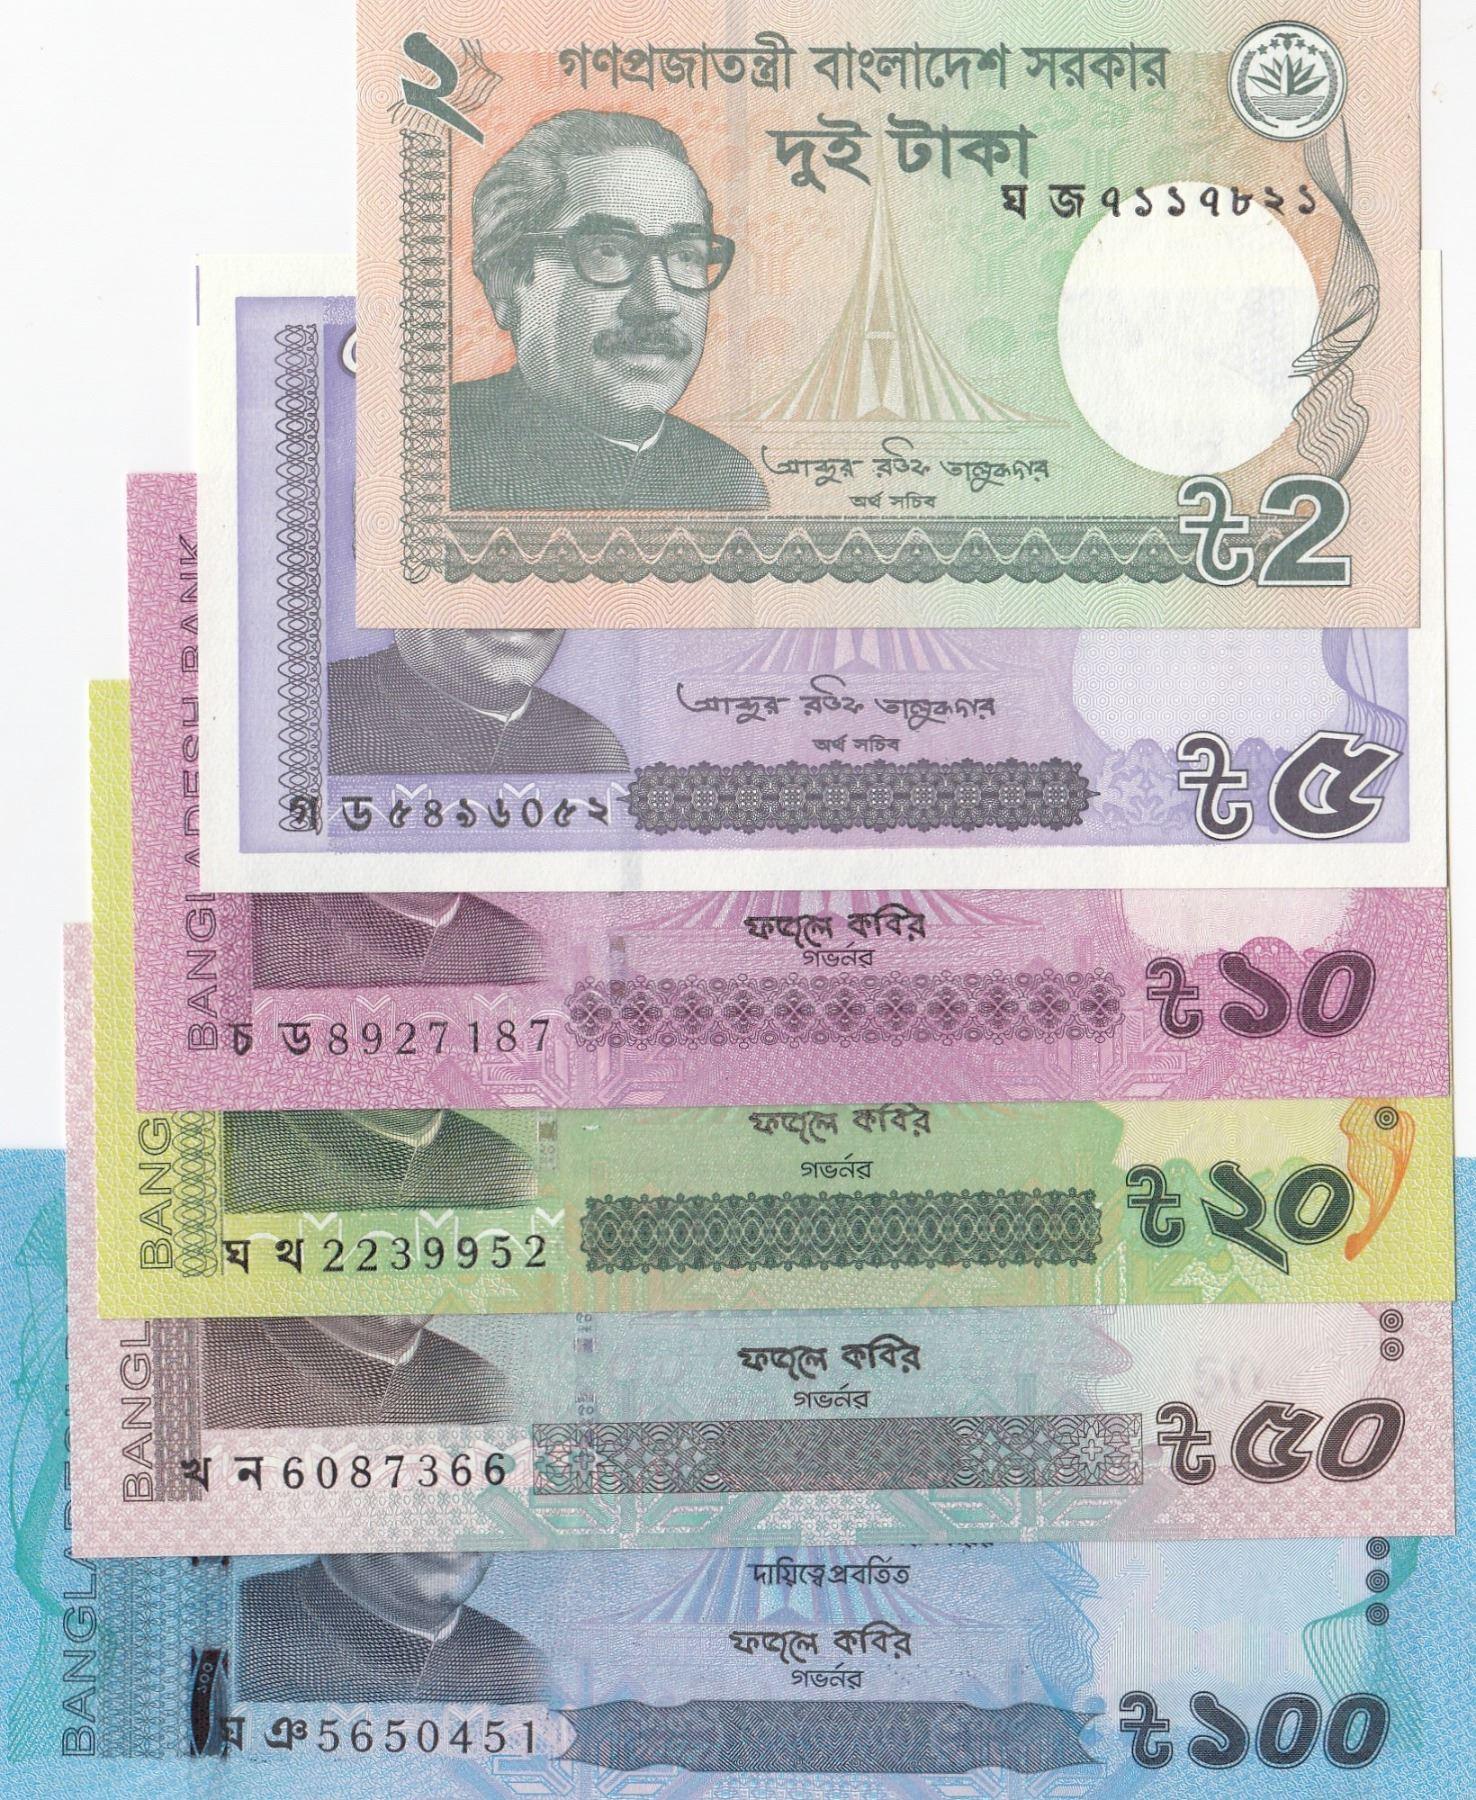 2017 P-NEW UNC World Currency BANGLADESH 5 Taka